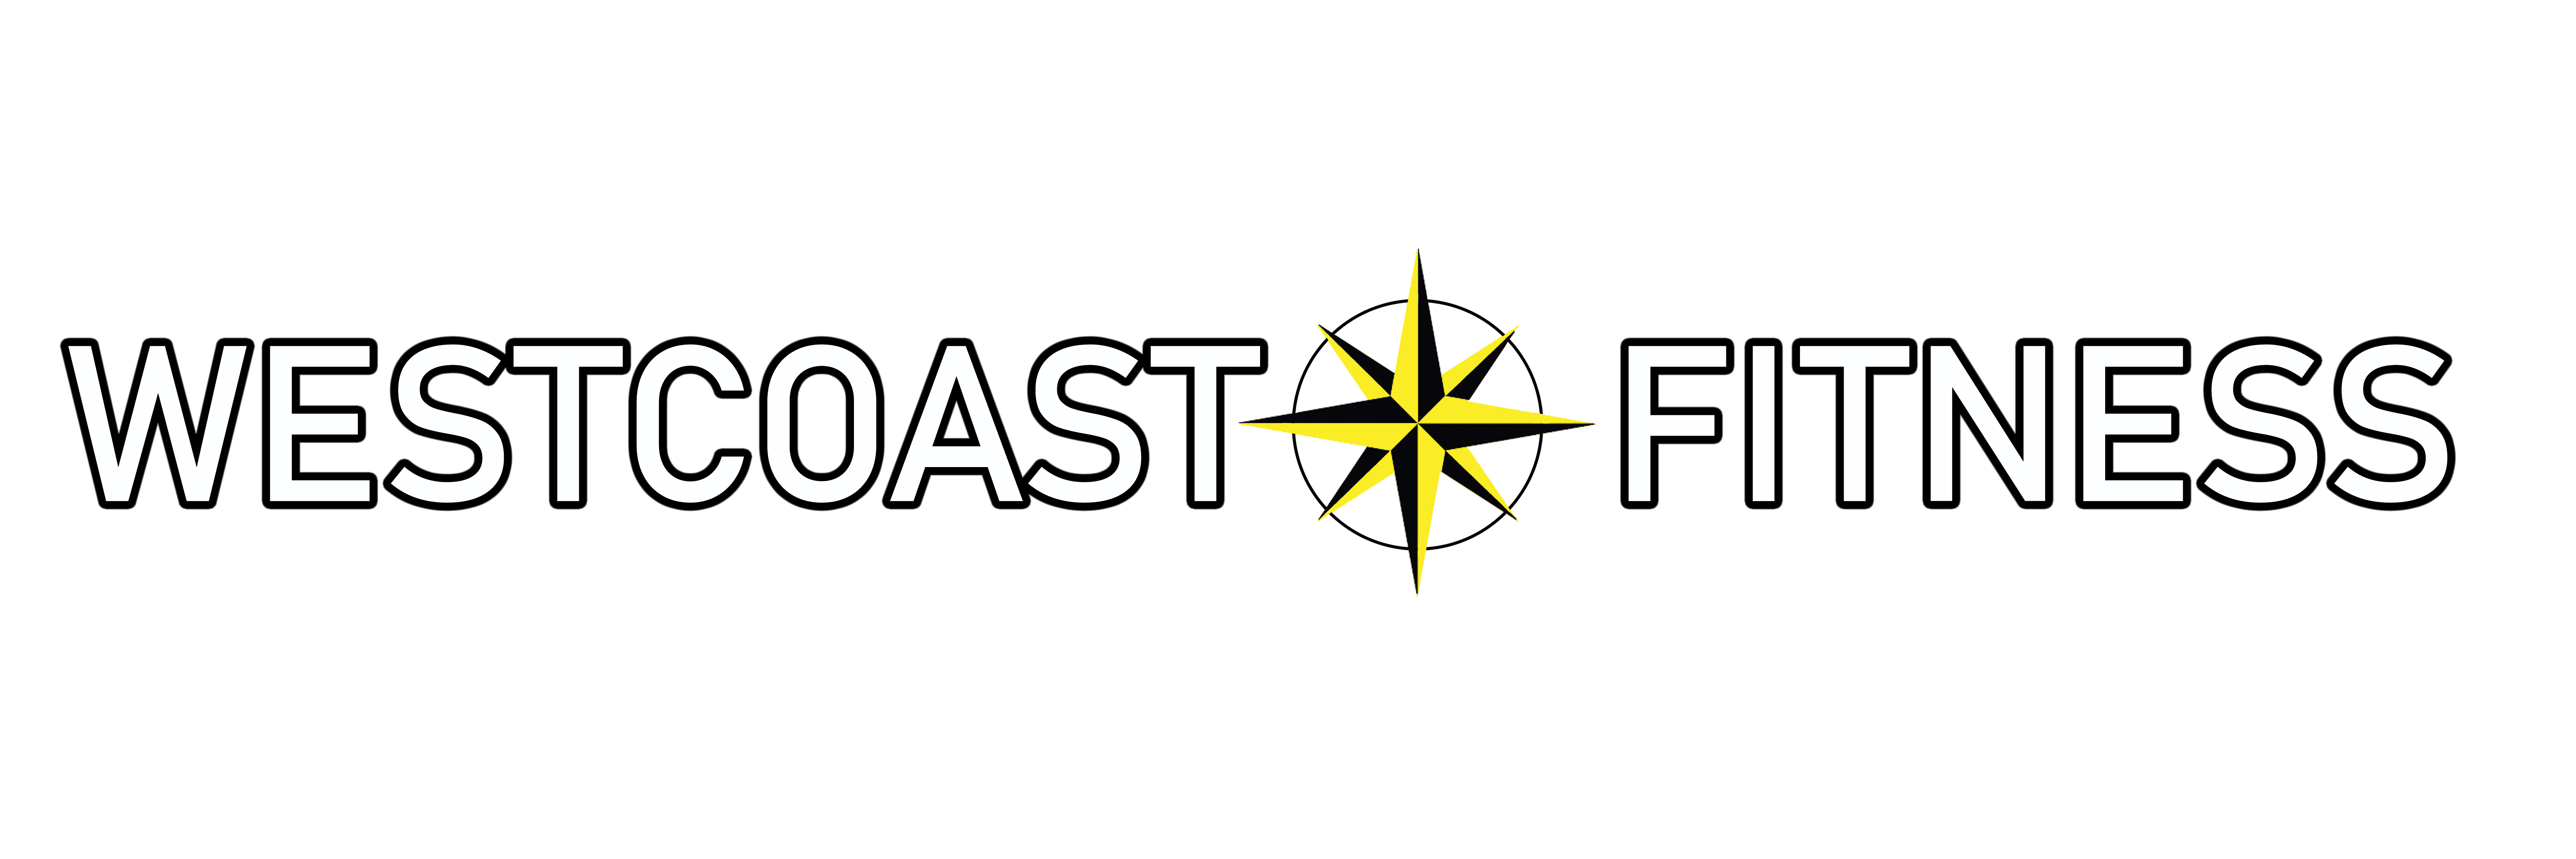 Westcoast Fitness